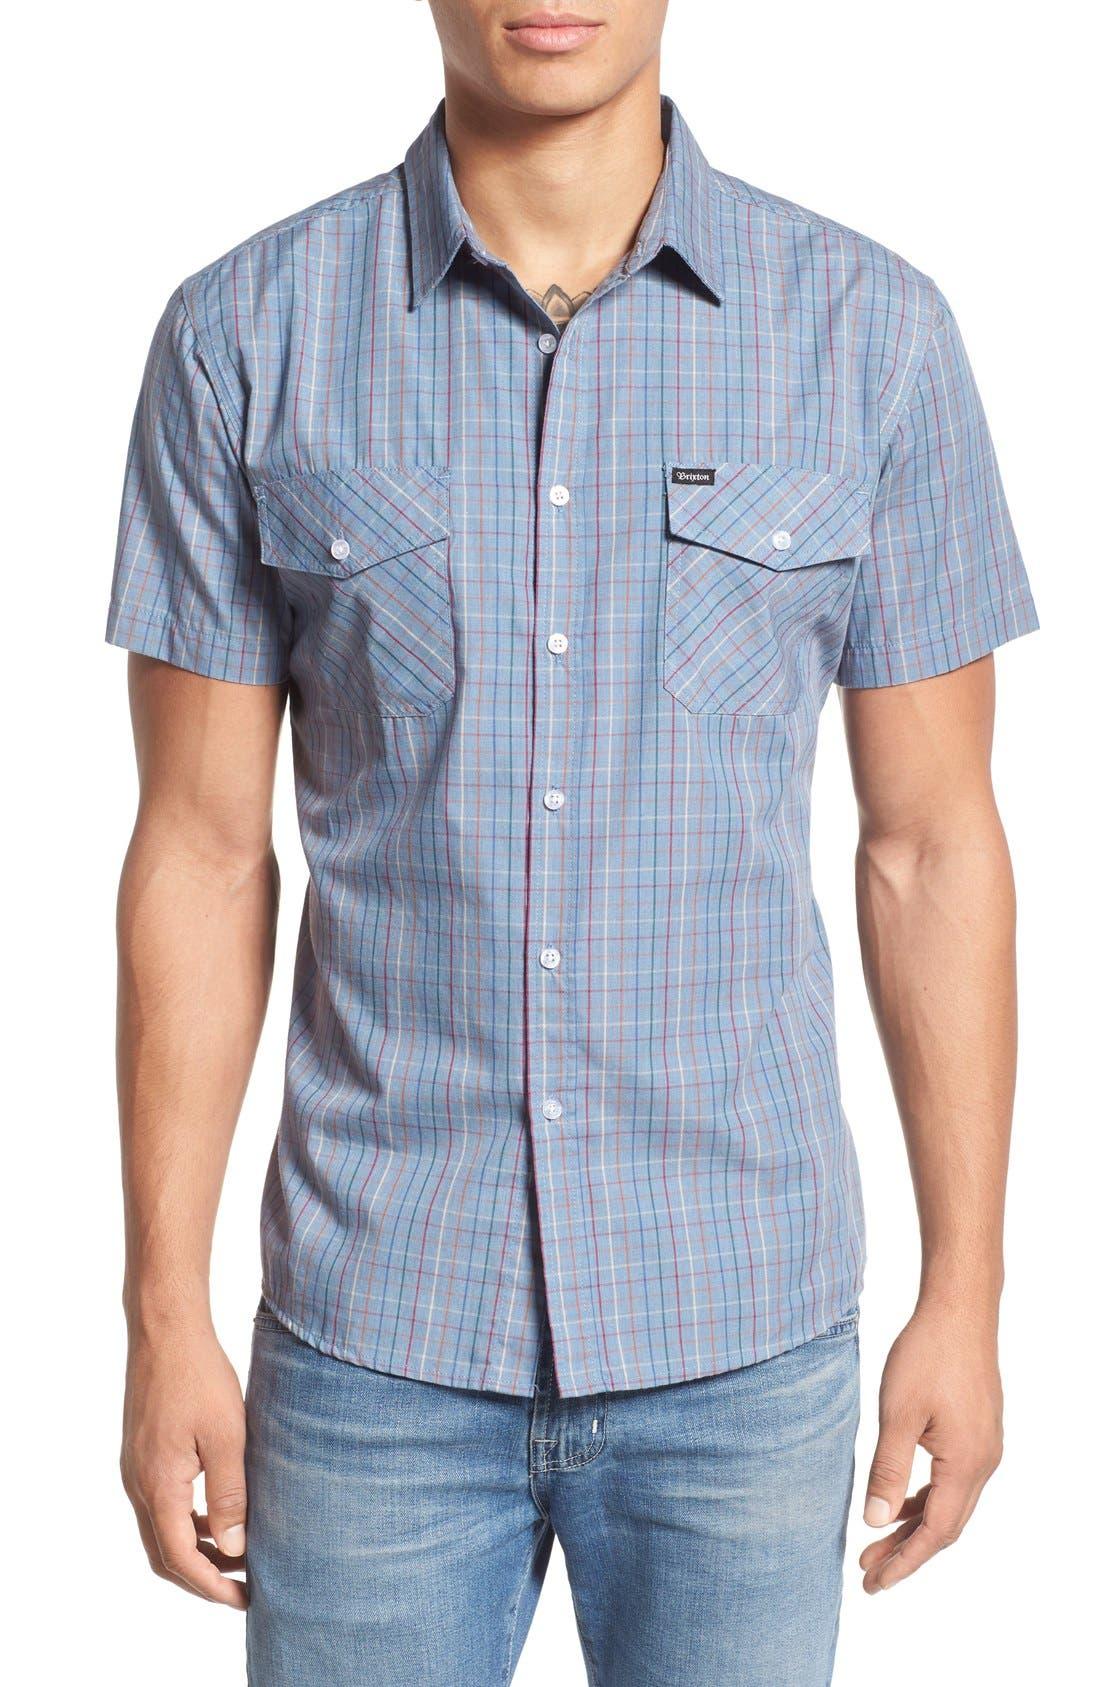 Alternate Image 1 Selected - Brixton 'Memphis' Trim Fit Plaid Short Sleeve Woven Shirt